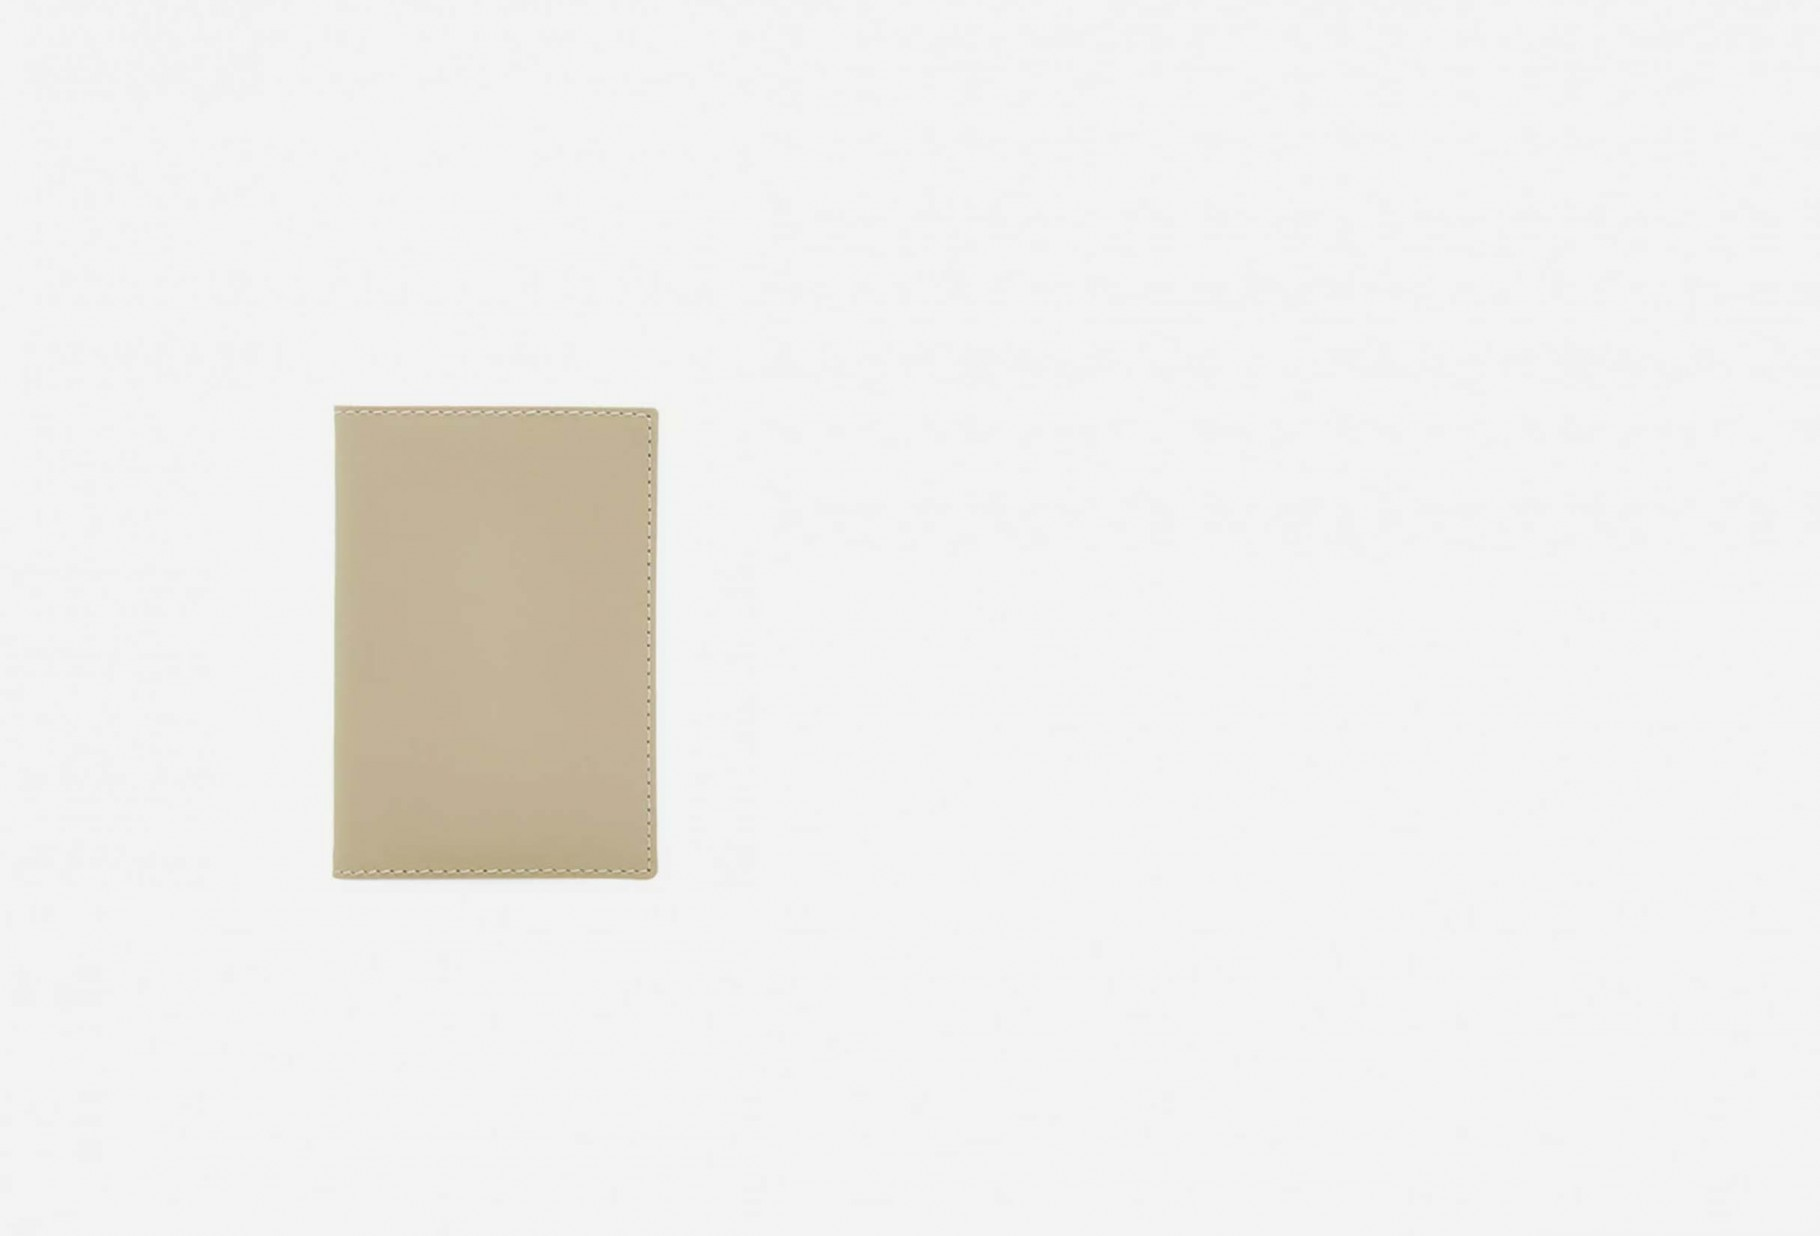 COMME DES GARÇONS WALLETS / Cdg leather wallet classic Sa6400 white